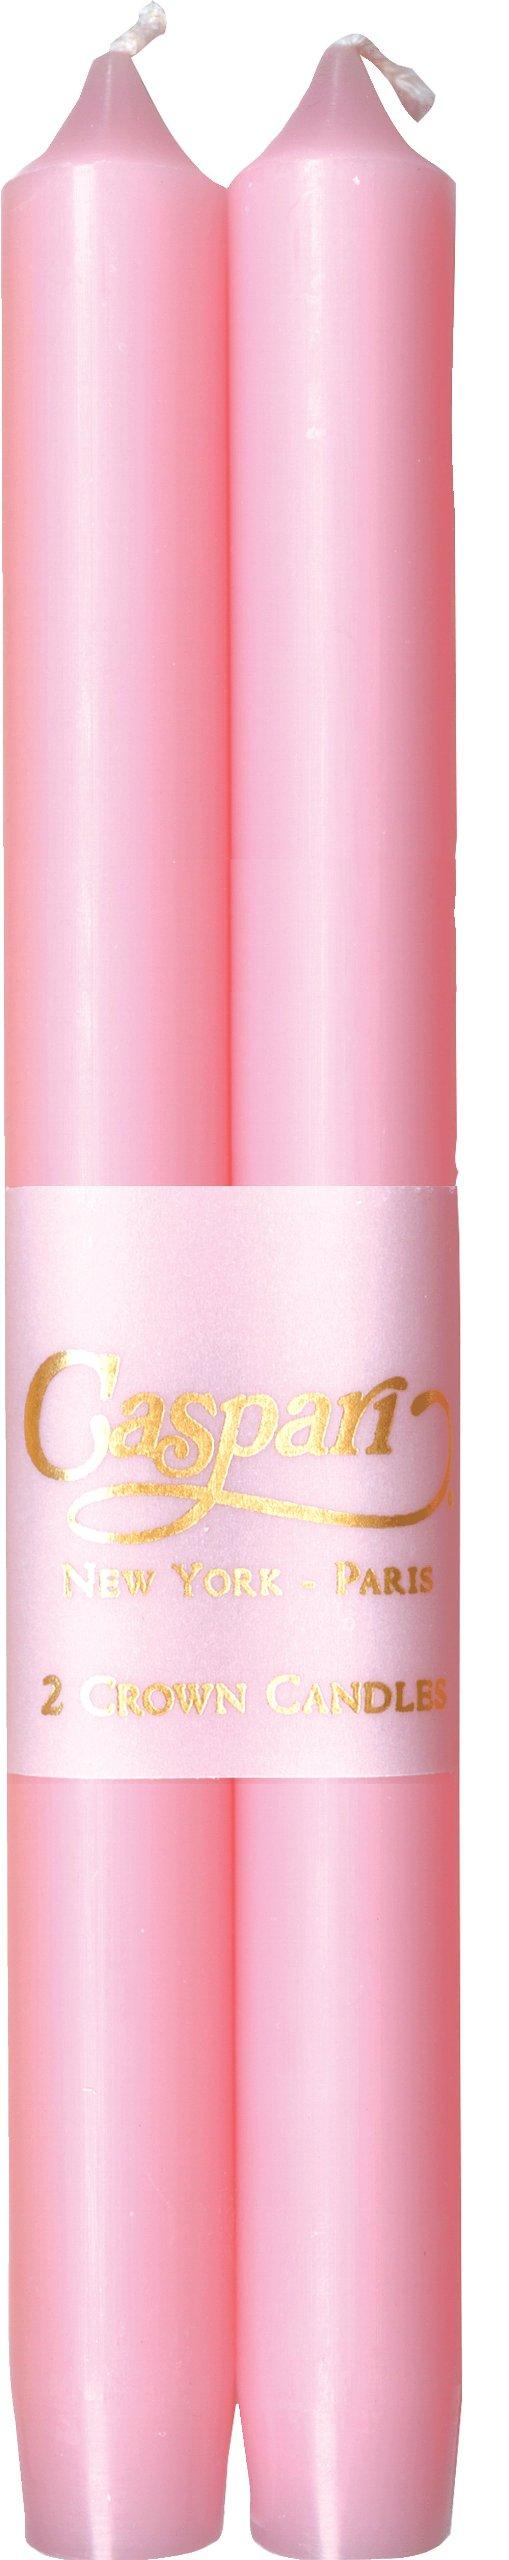 Caspari - Fancy 10-Inch Taper Dripless, Smokeless, Candlesticks, Petal Pink, Set of 2